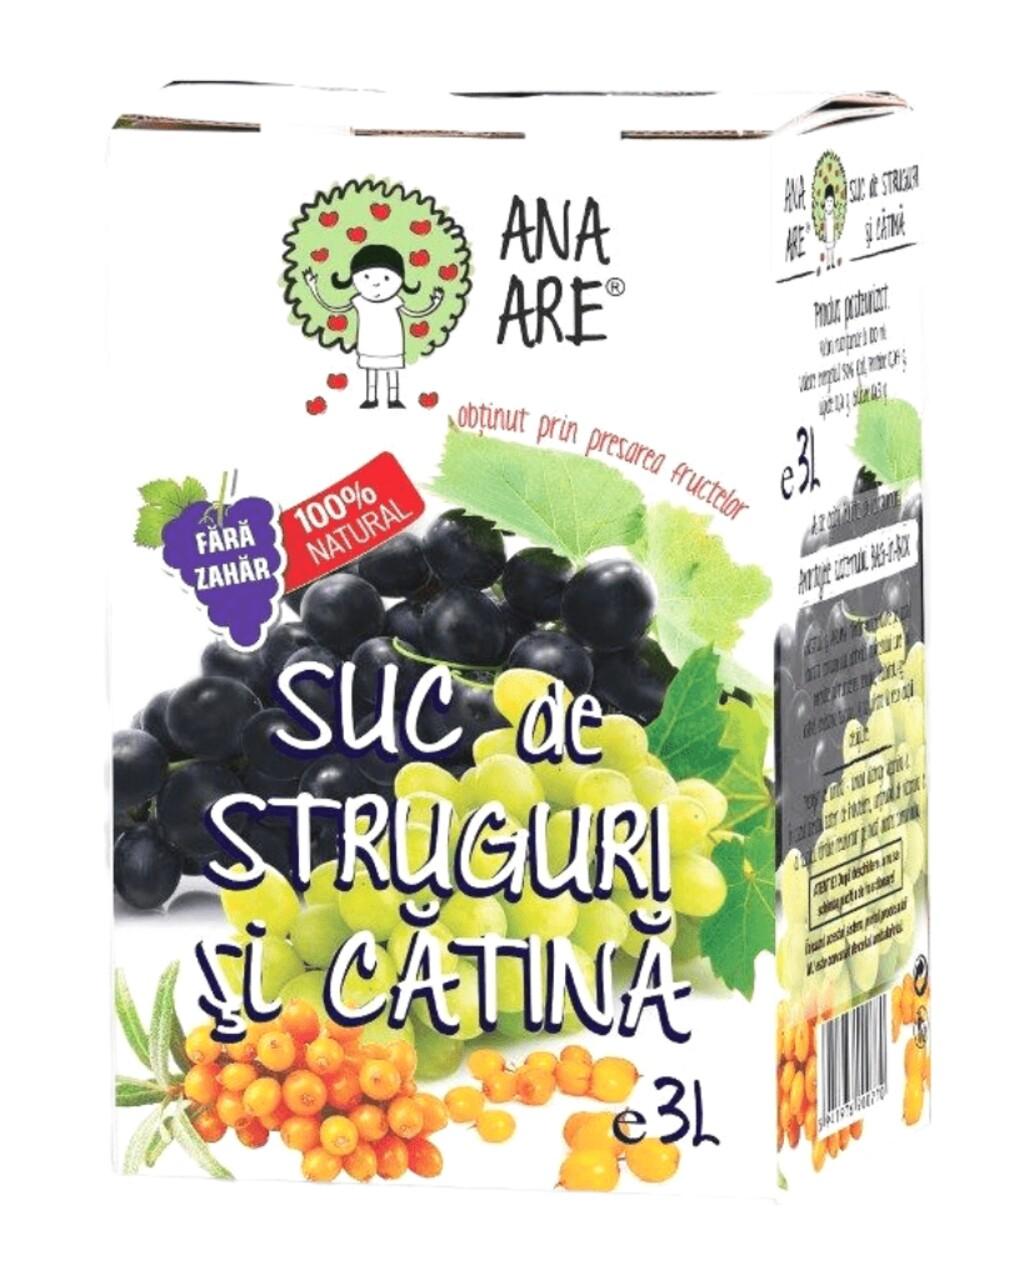 Suc de Struguri & Catina 100% Natural Ana Are 3L